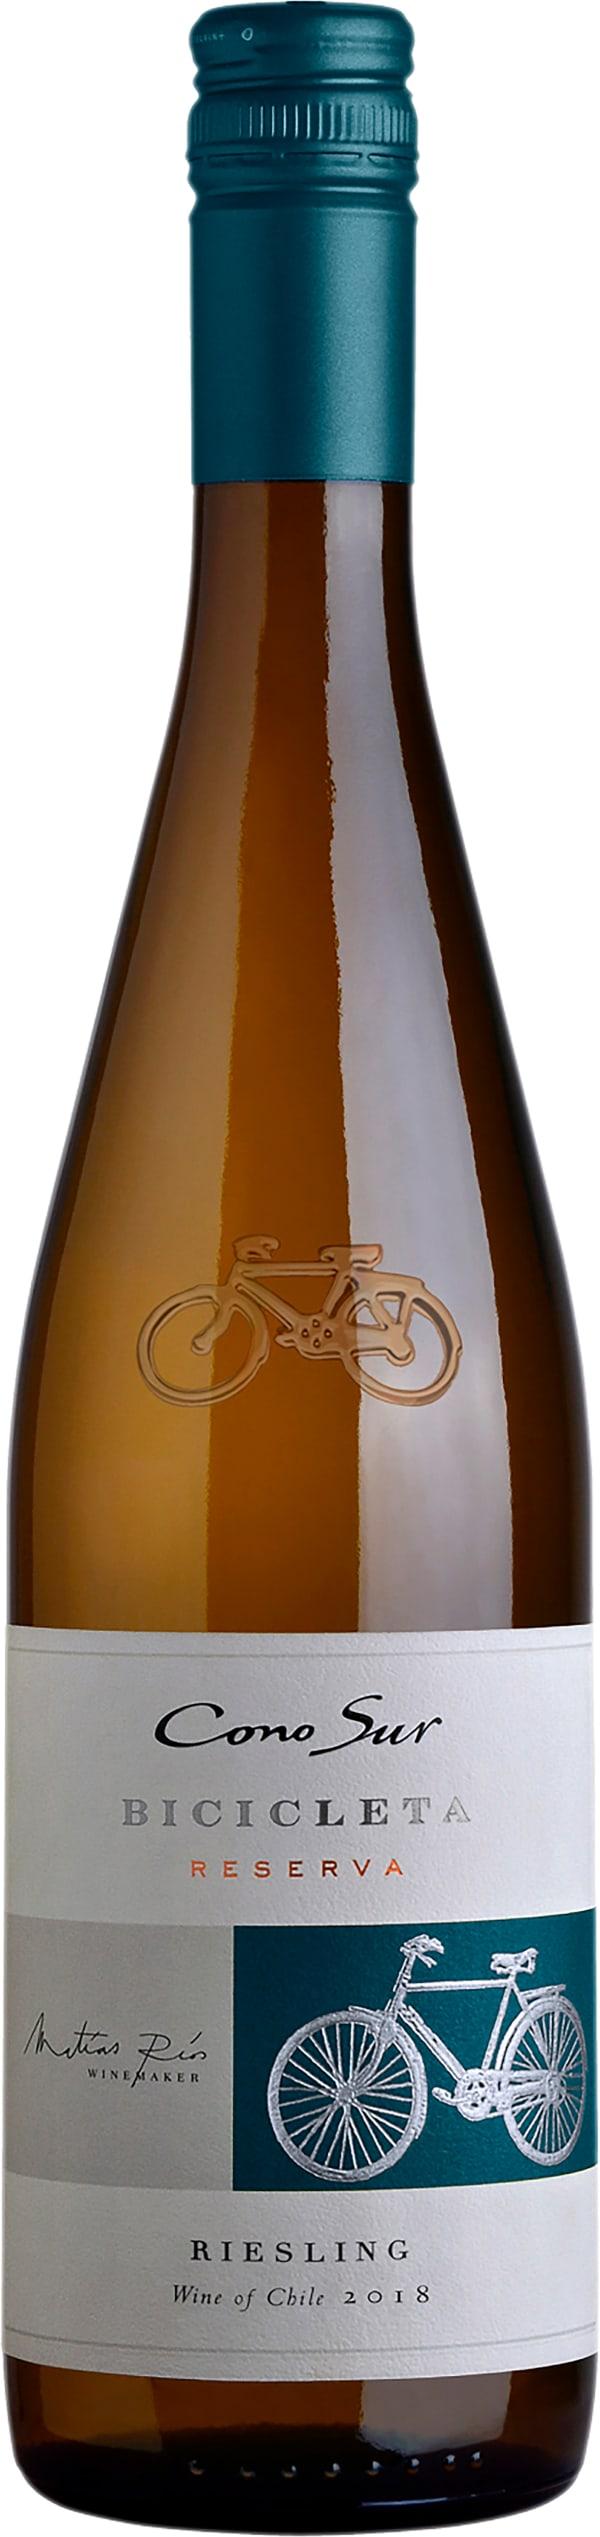 Cono Sur Bicicleta Riesling 2019